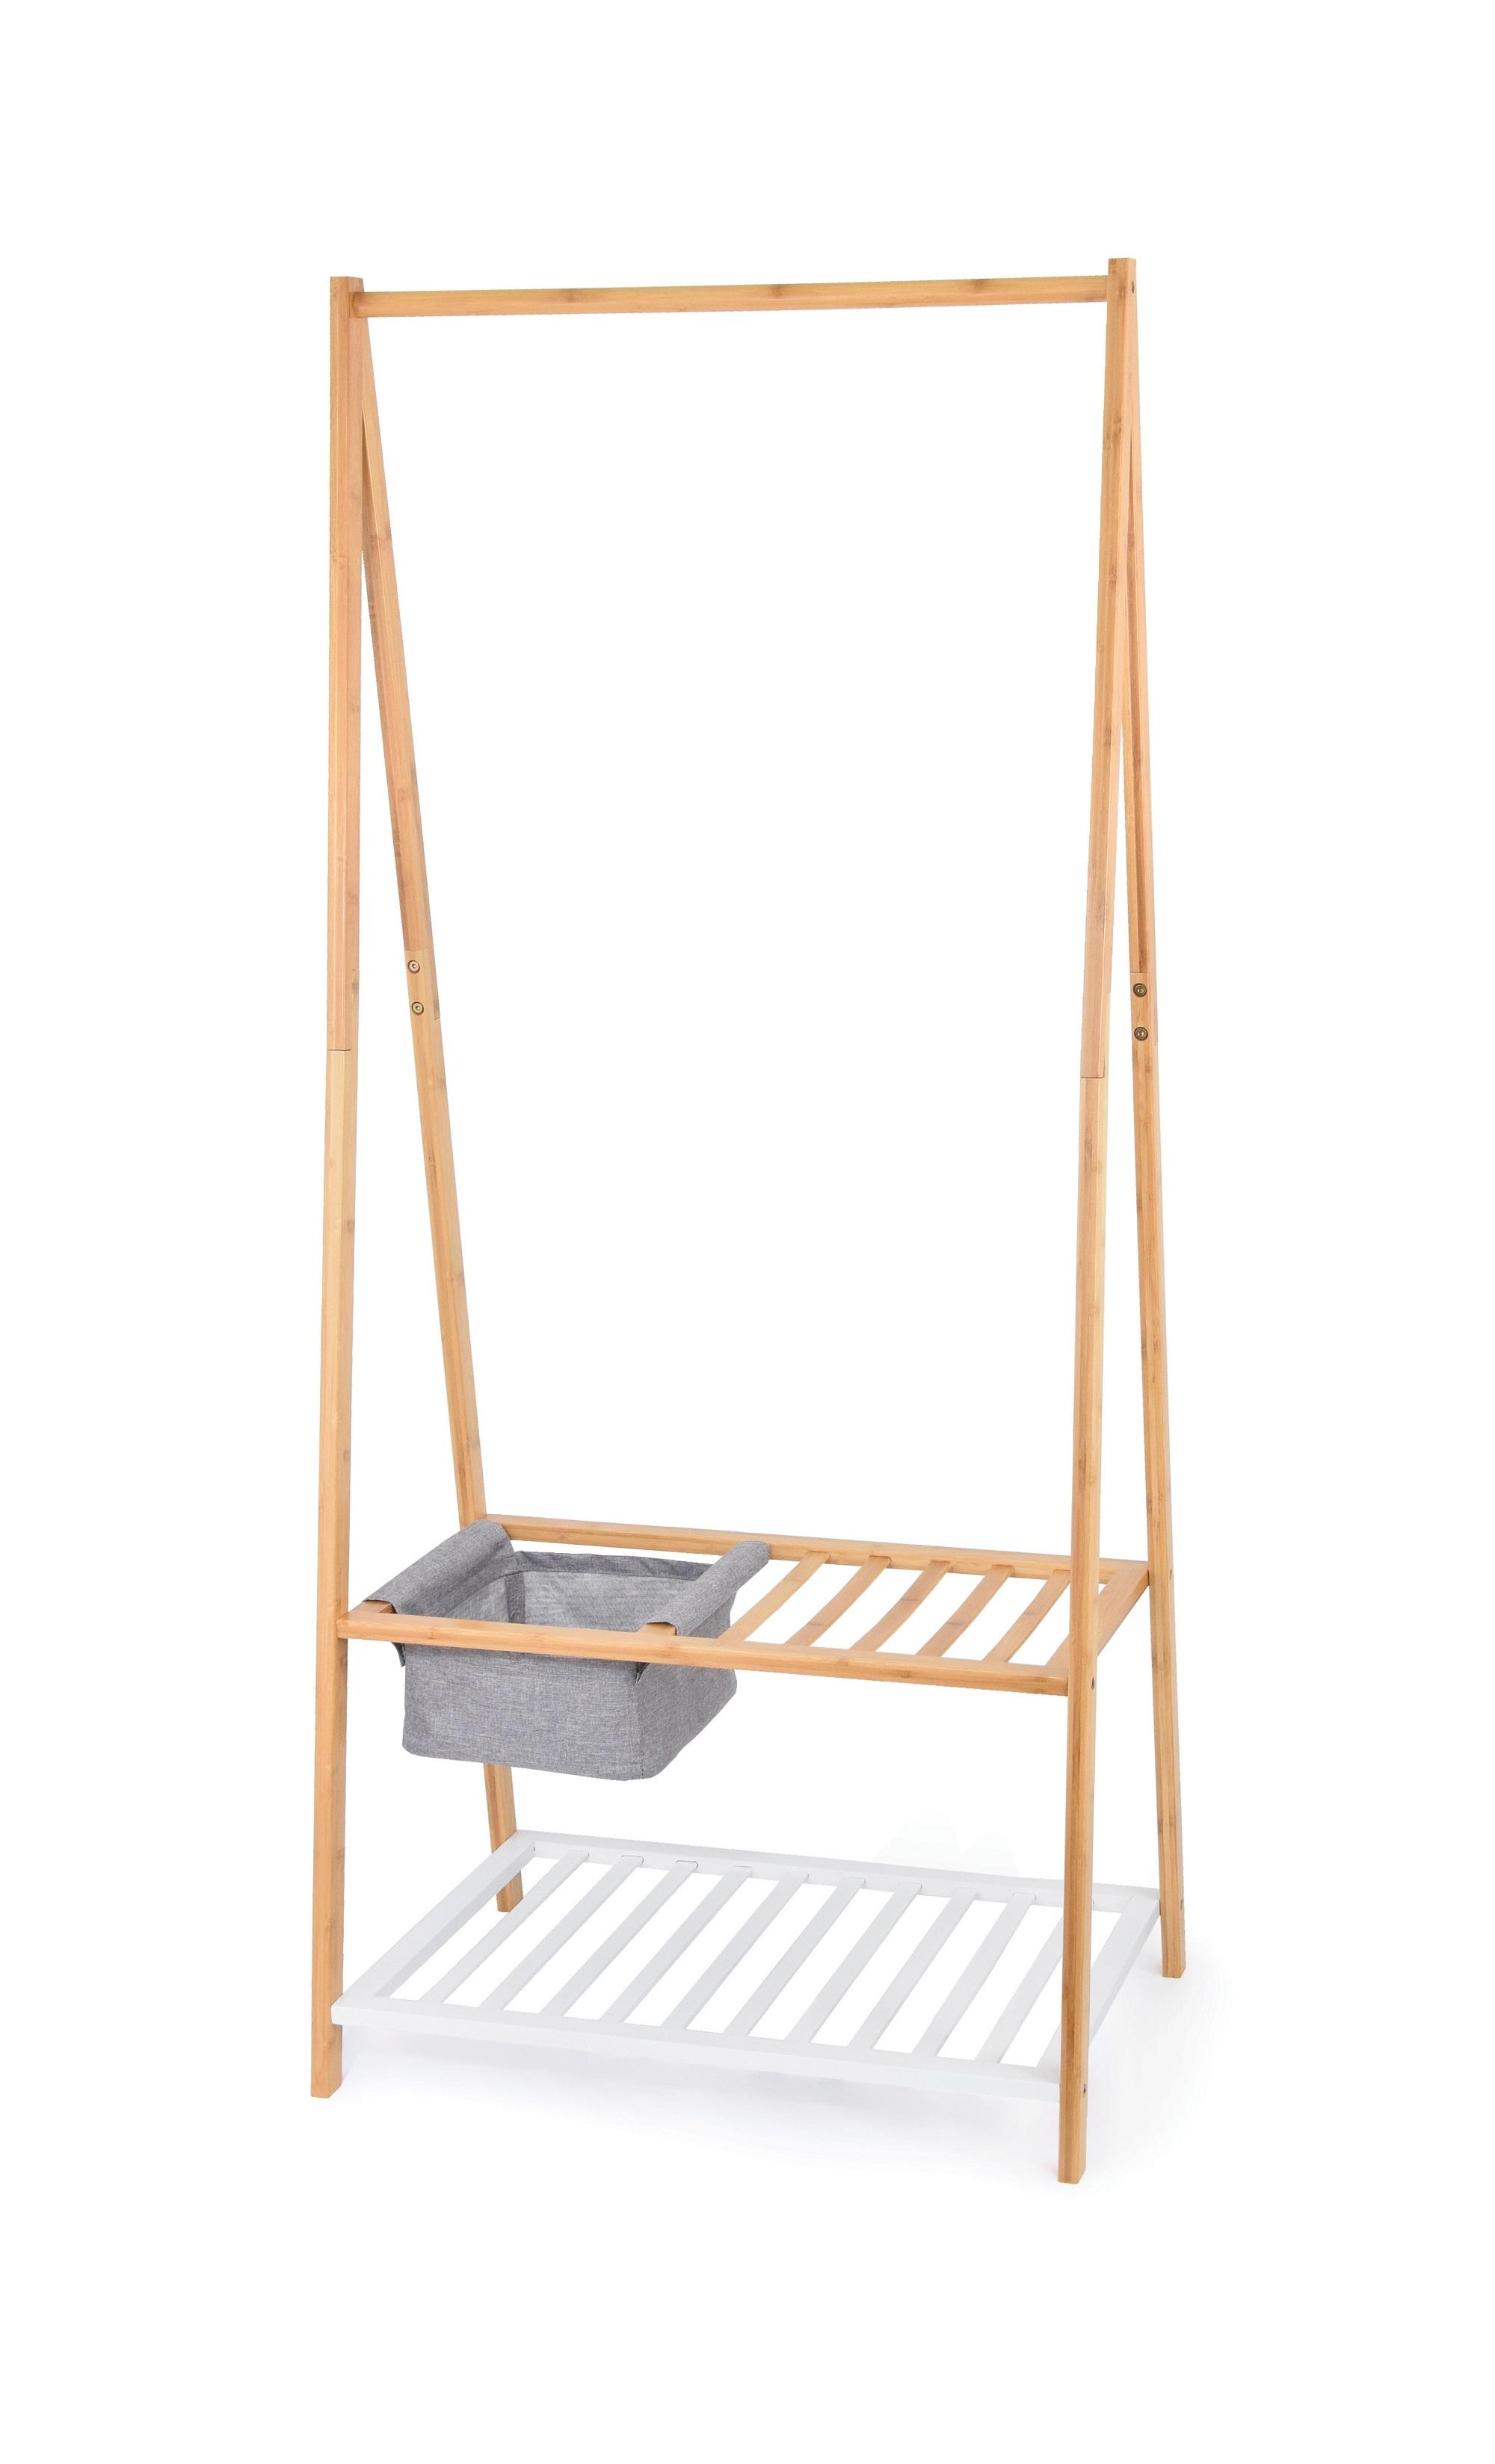 Suport pentru umerase si incaltaminte, cu cos pentru depozitare, Bamboo Natural / Alb, l70xA45xH160 cm poza